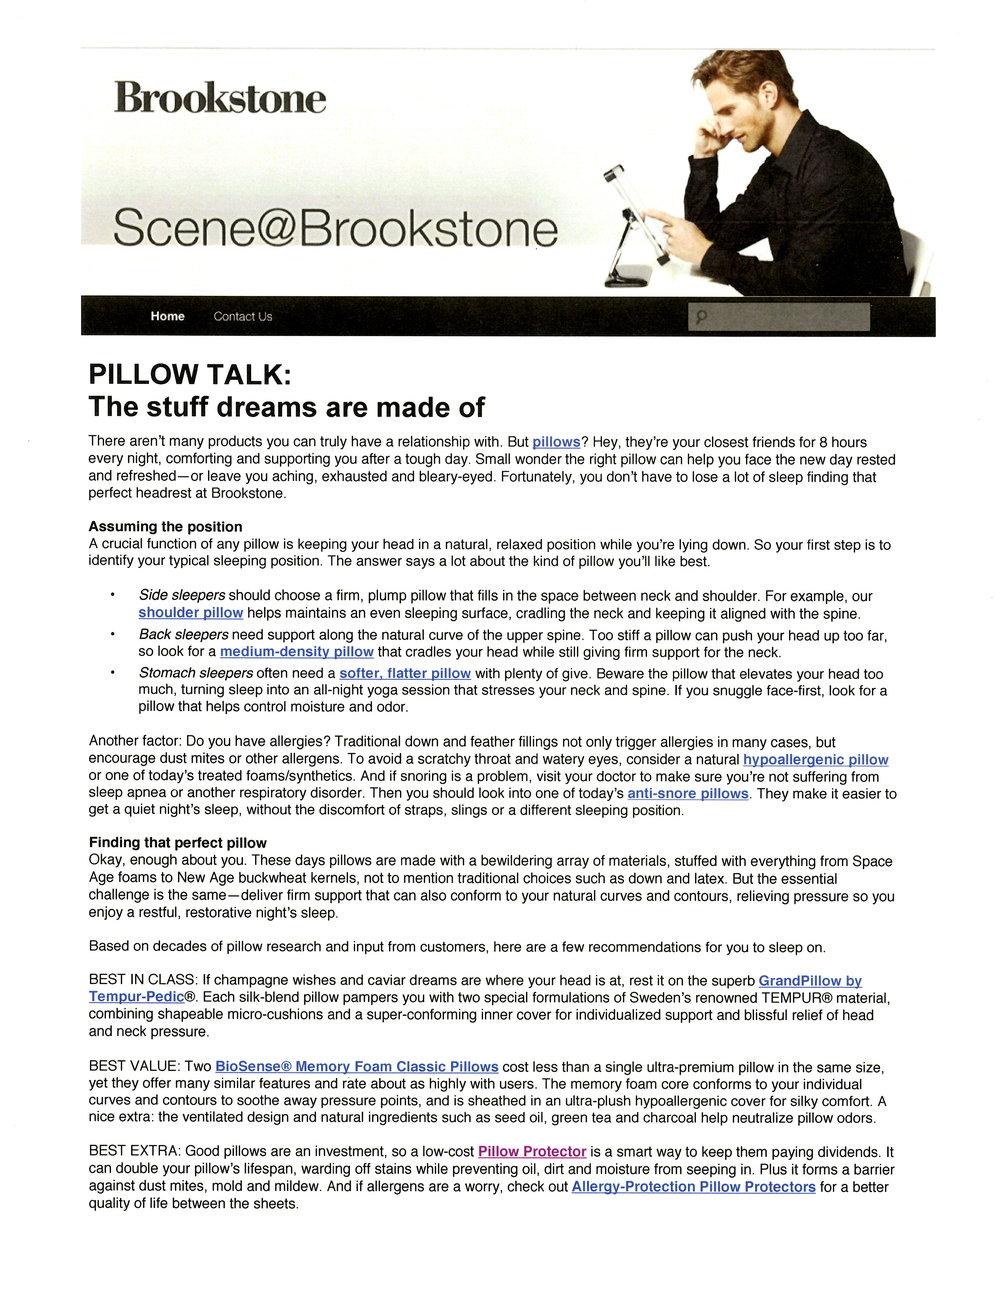 Brookstone Corp. - Blog Entry